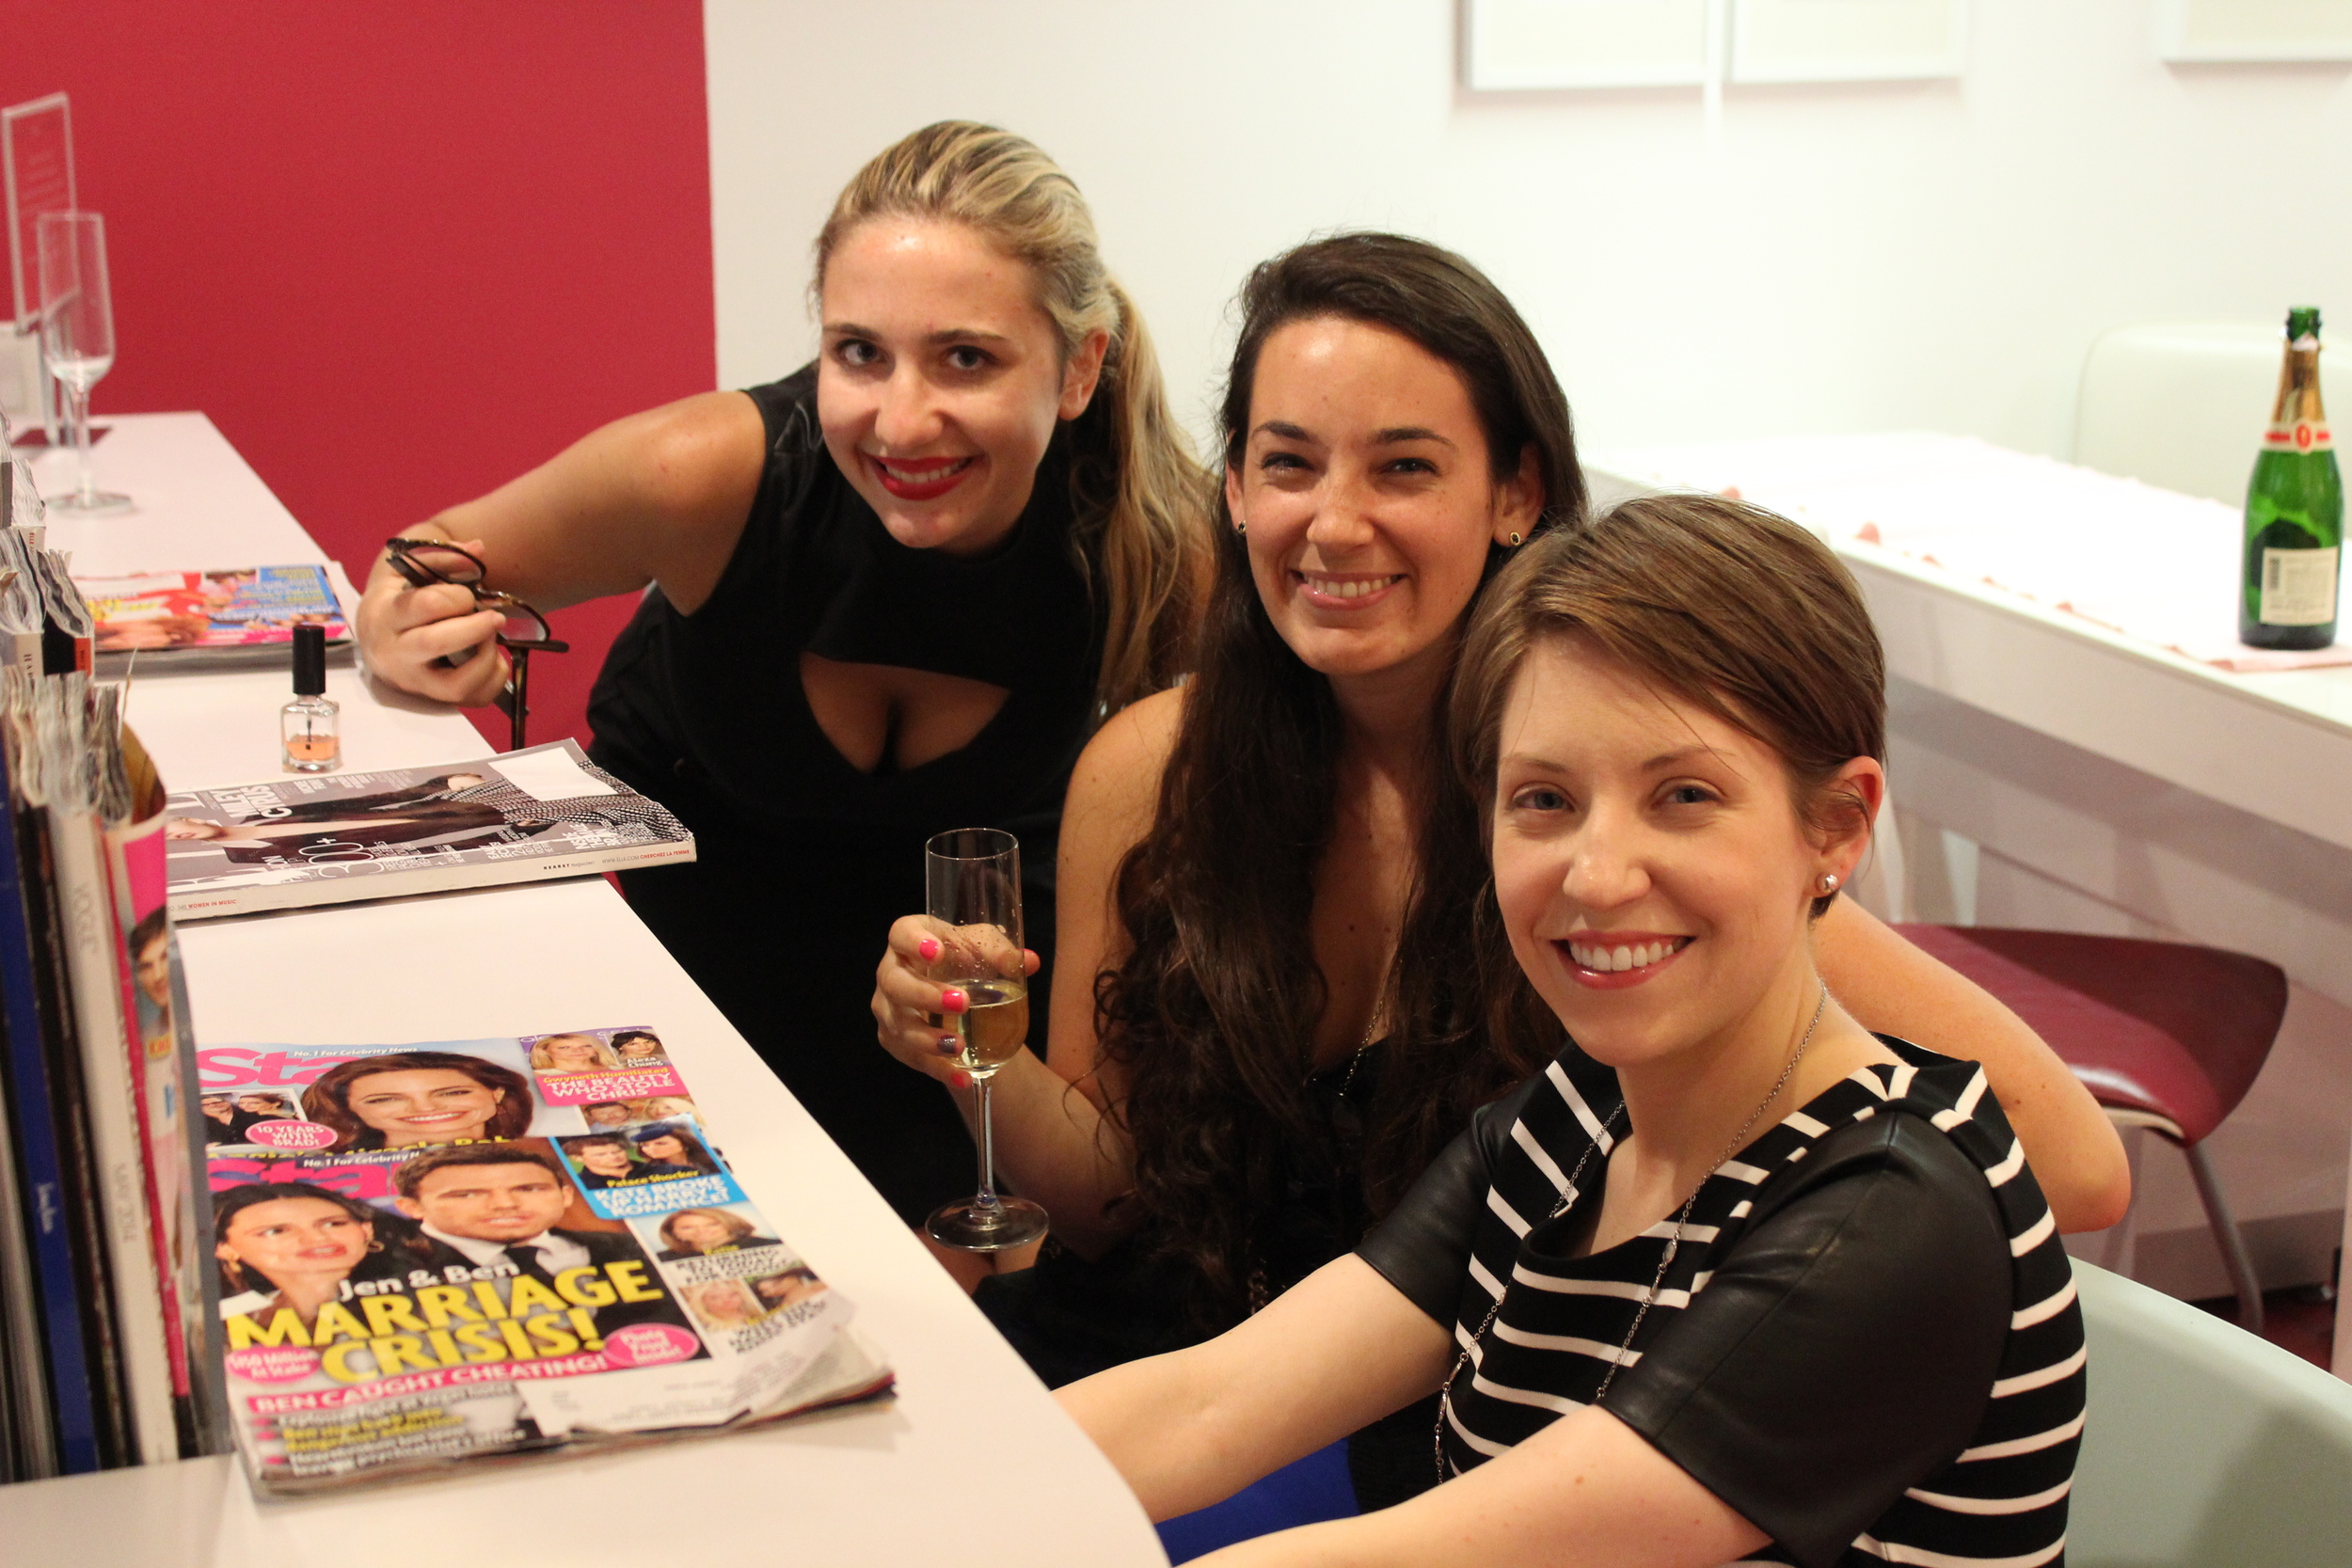 Melissa, Sydnee and Rachel - Stern Hotties